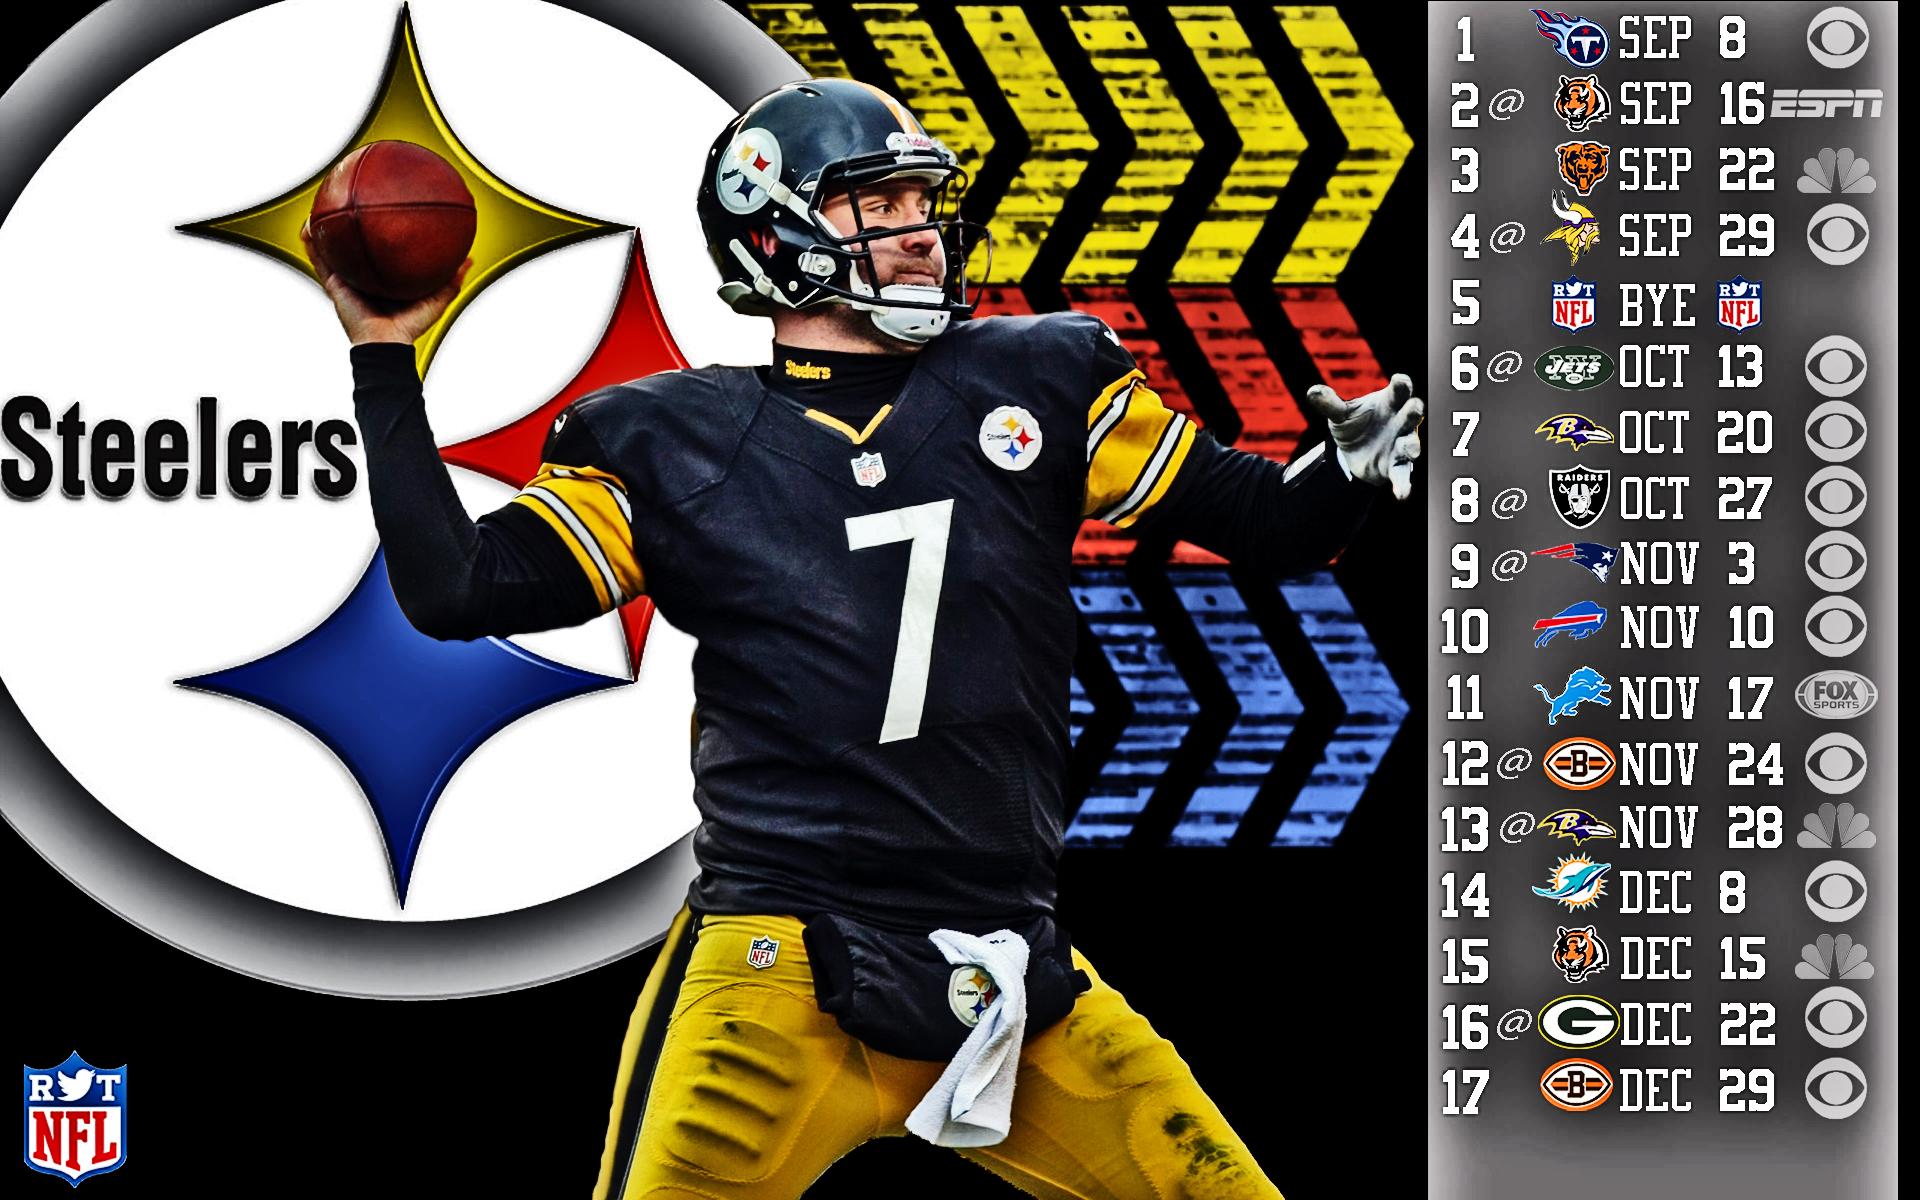 2013 Pittsburgh Steelers football nfl wallpaper 1920x1200 130424 1920x1200